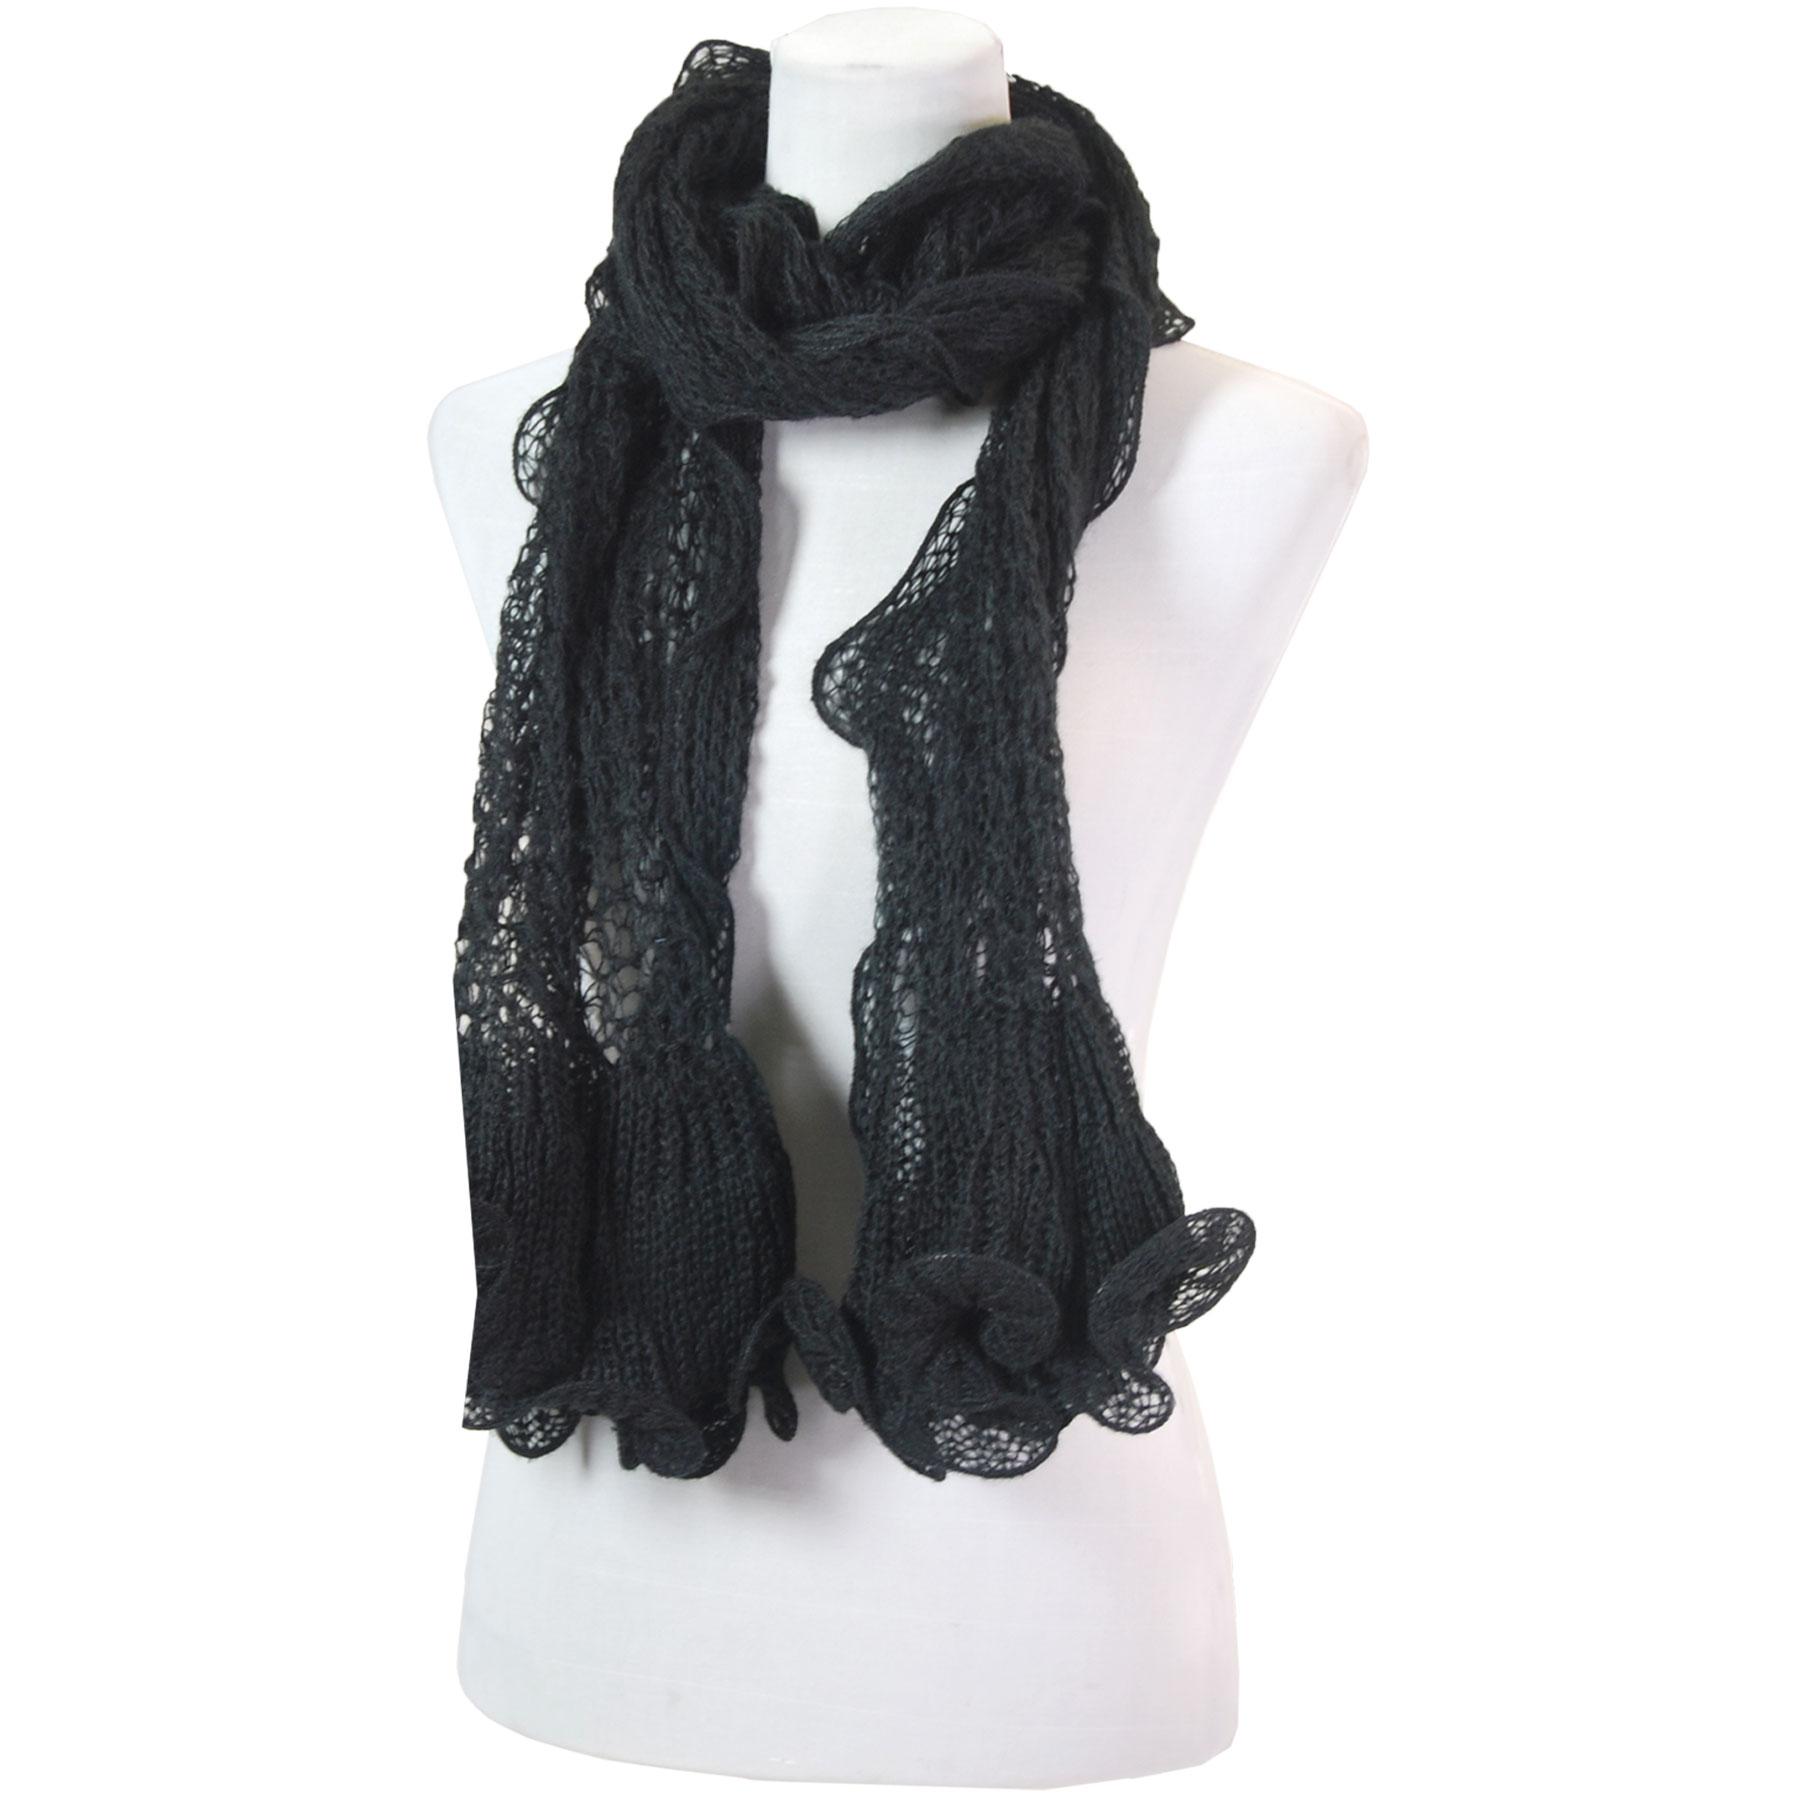 Oblong Scarves - Crochet Wave 4068*